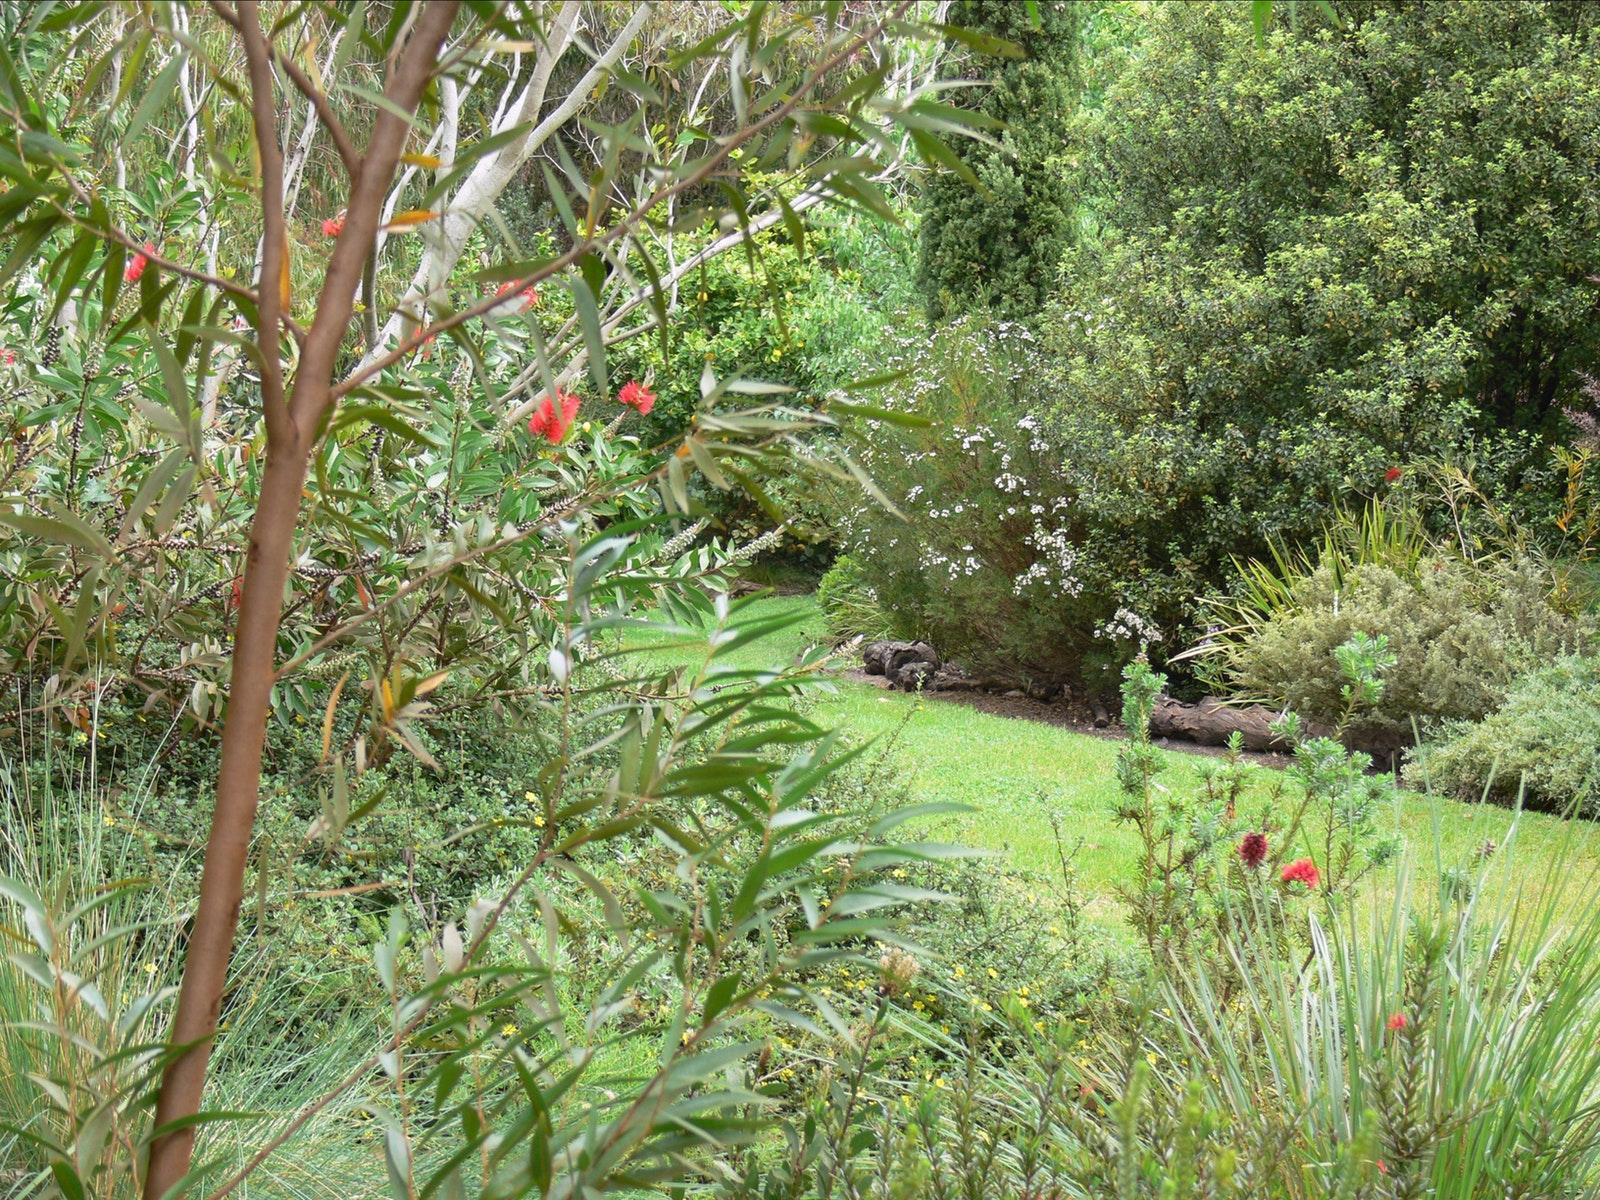 A section of the bottom garden